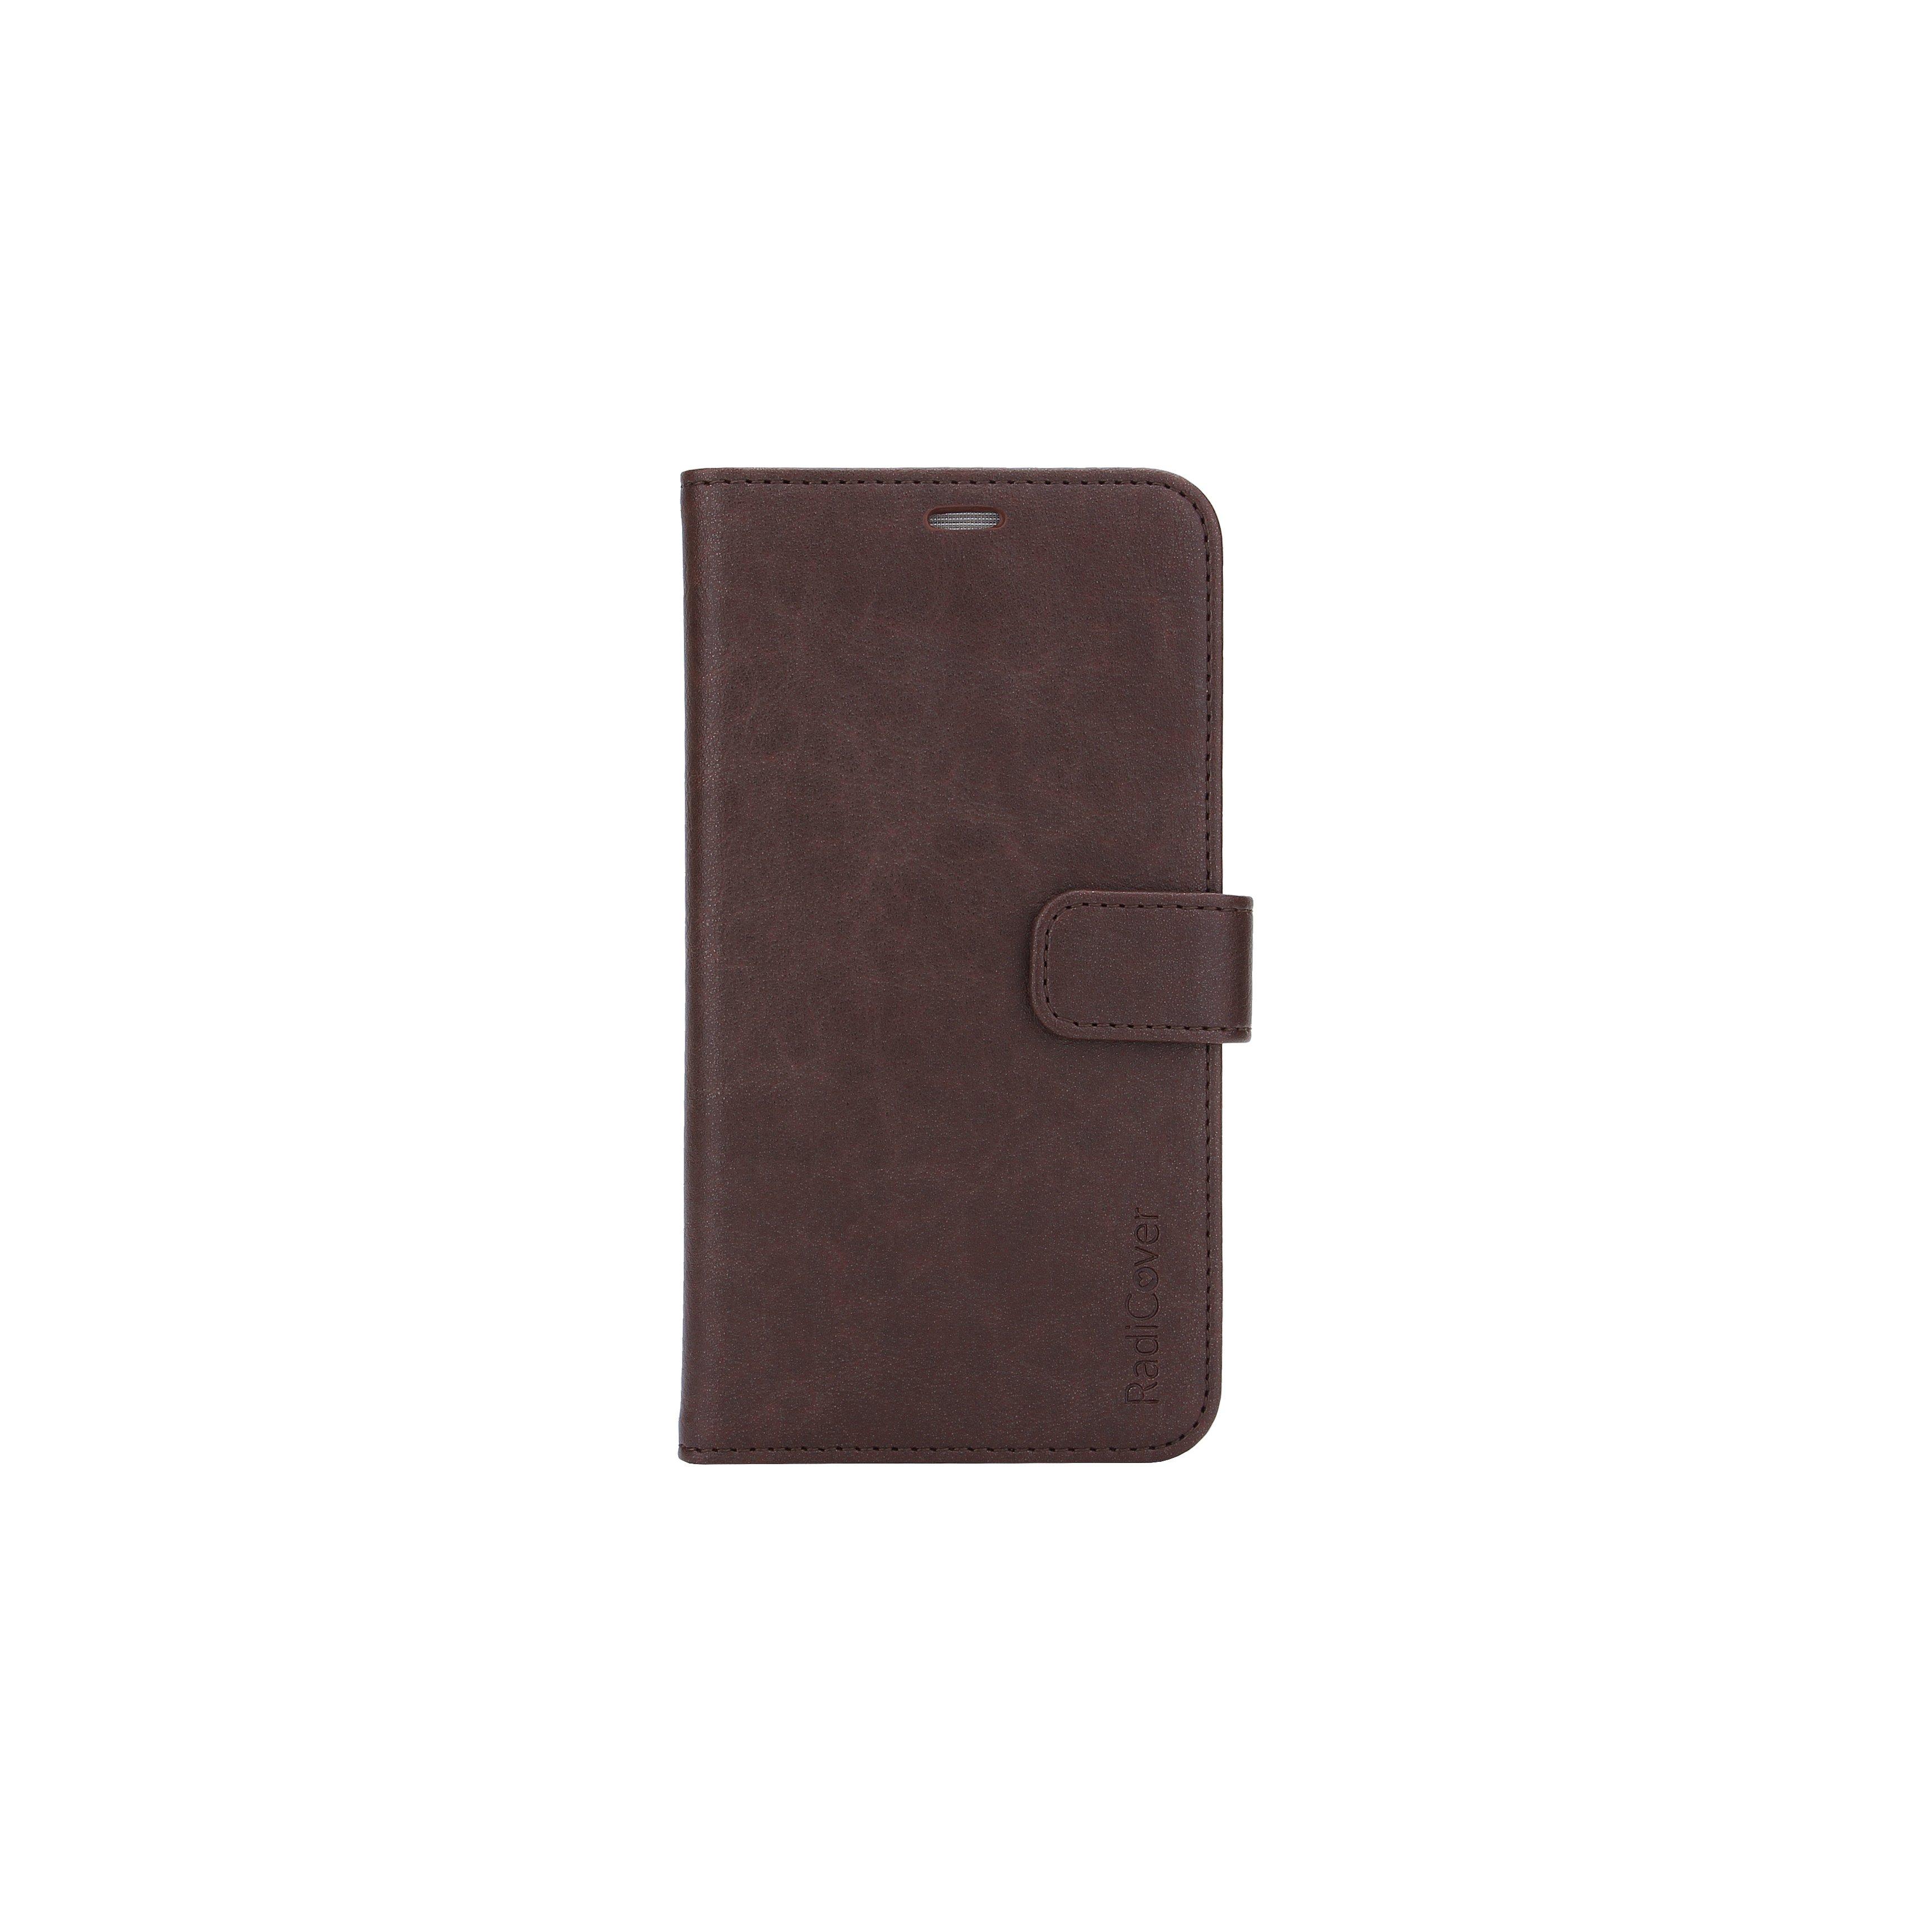 RadiCover - Radiationprotected Mobilewallet PU iPhone 11 - Brown